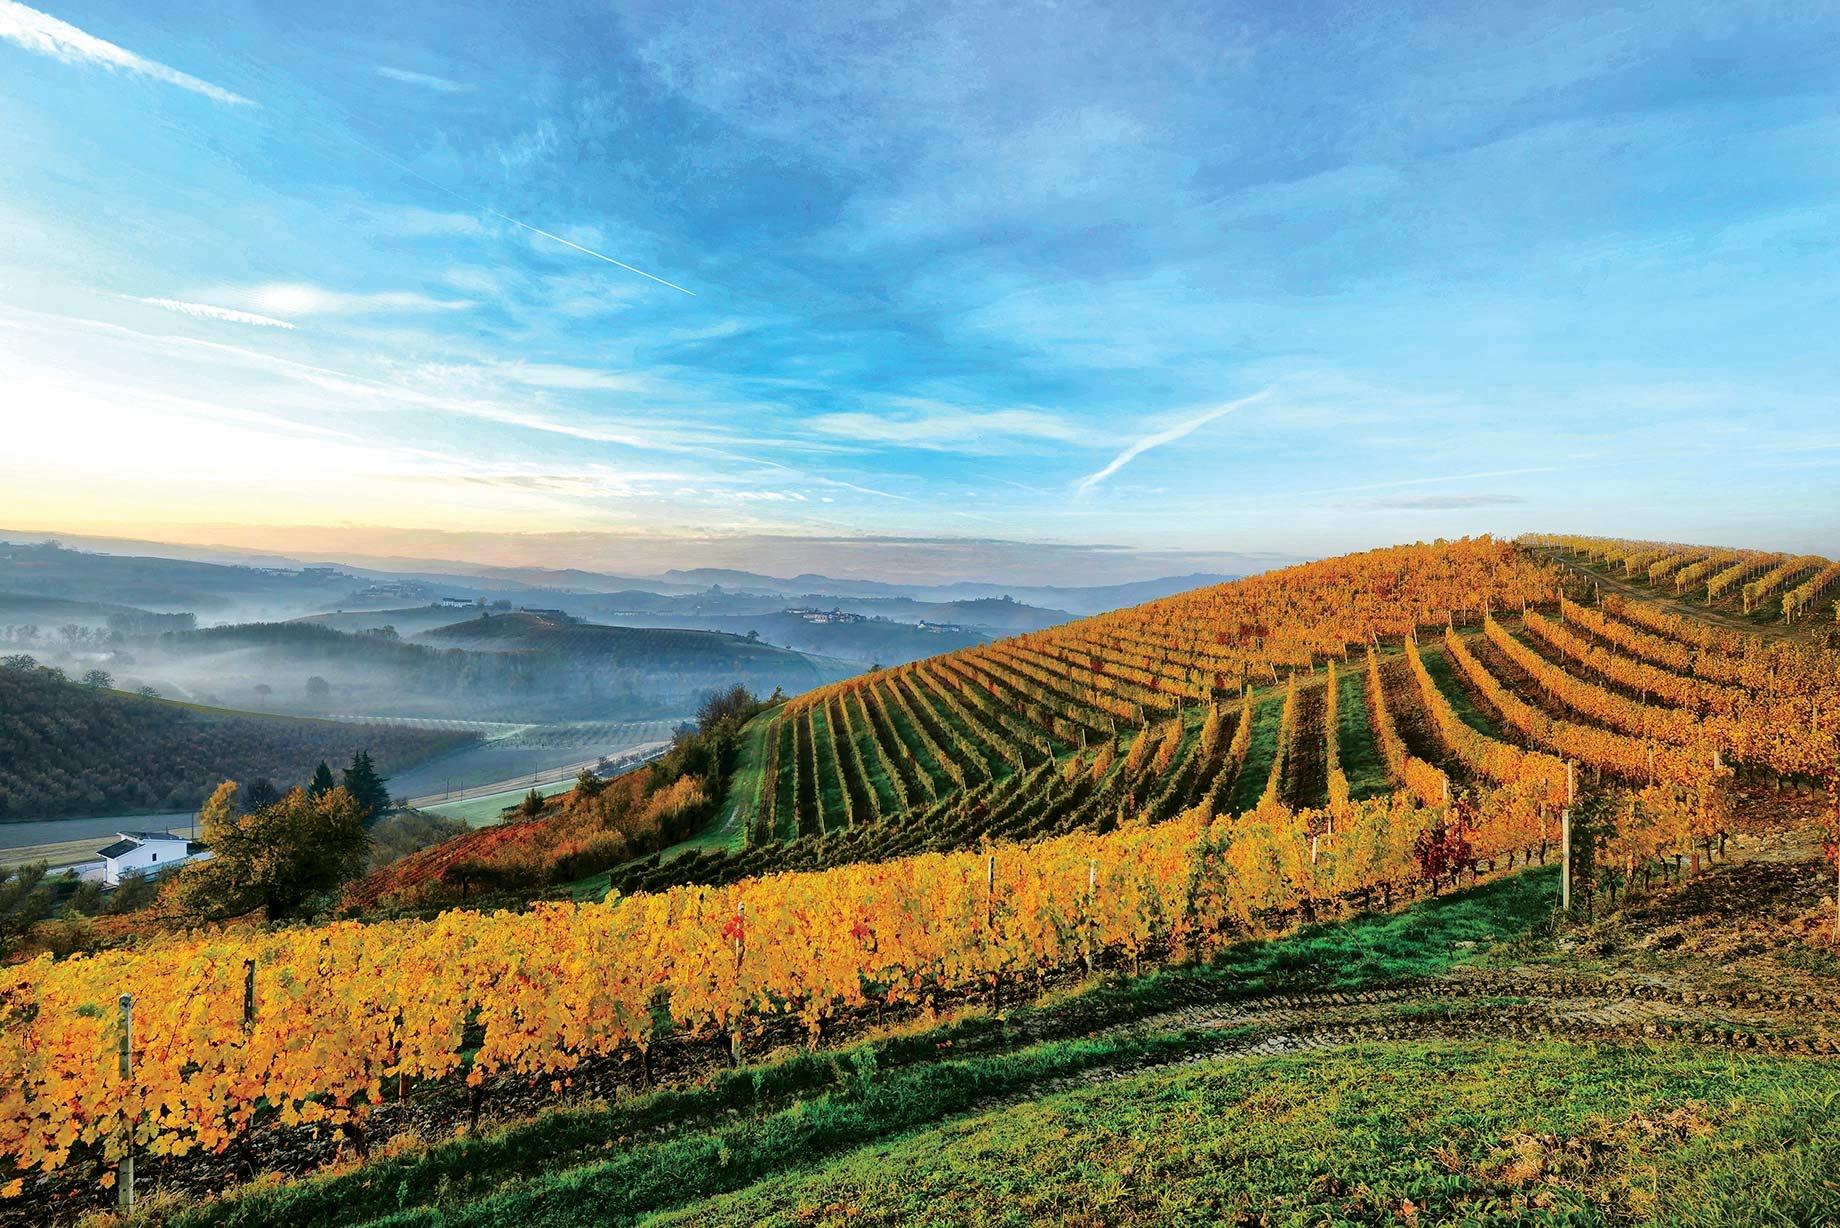 A Michelin Starred Winemaker Dinner at Maison Belge